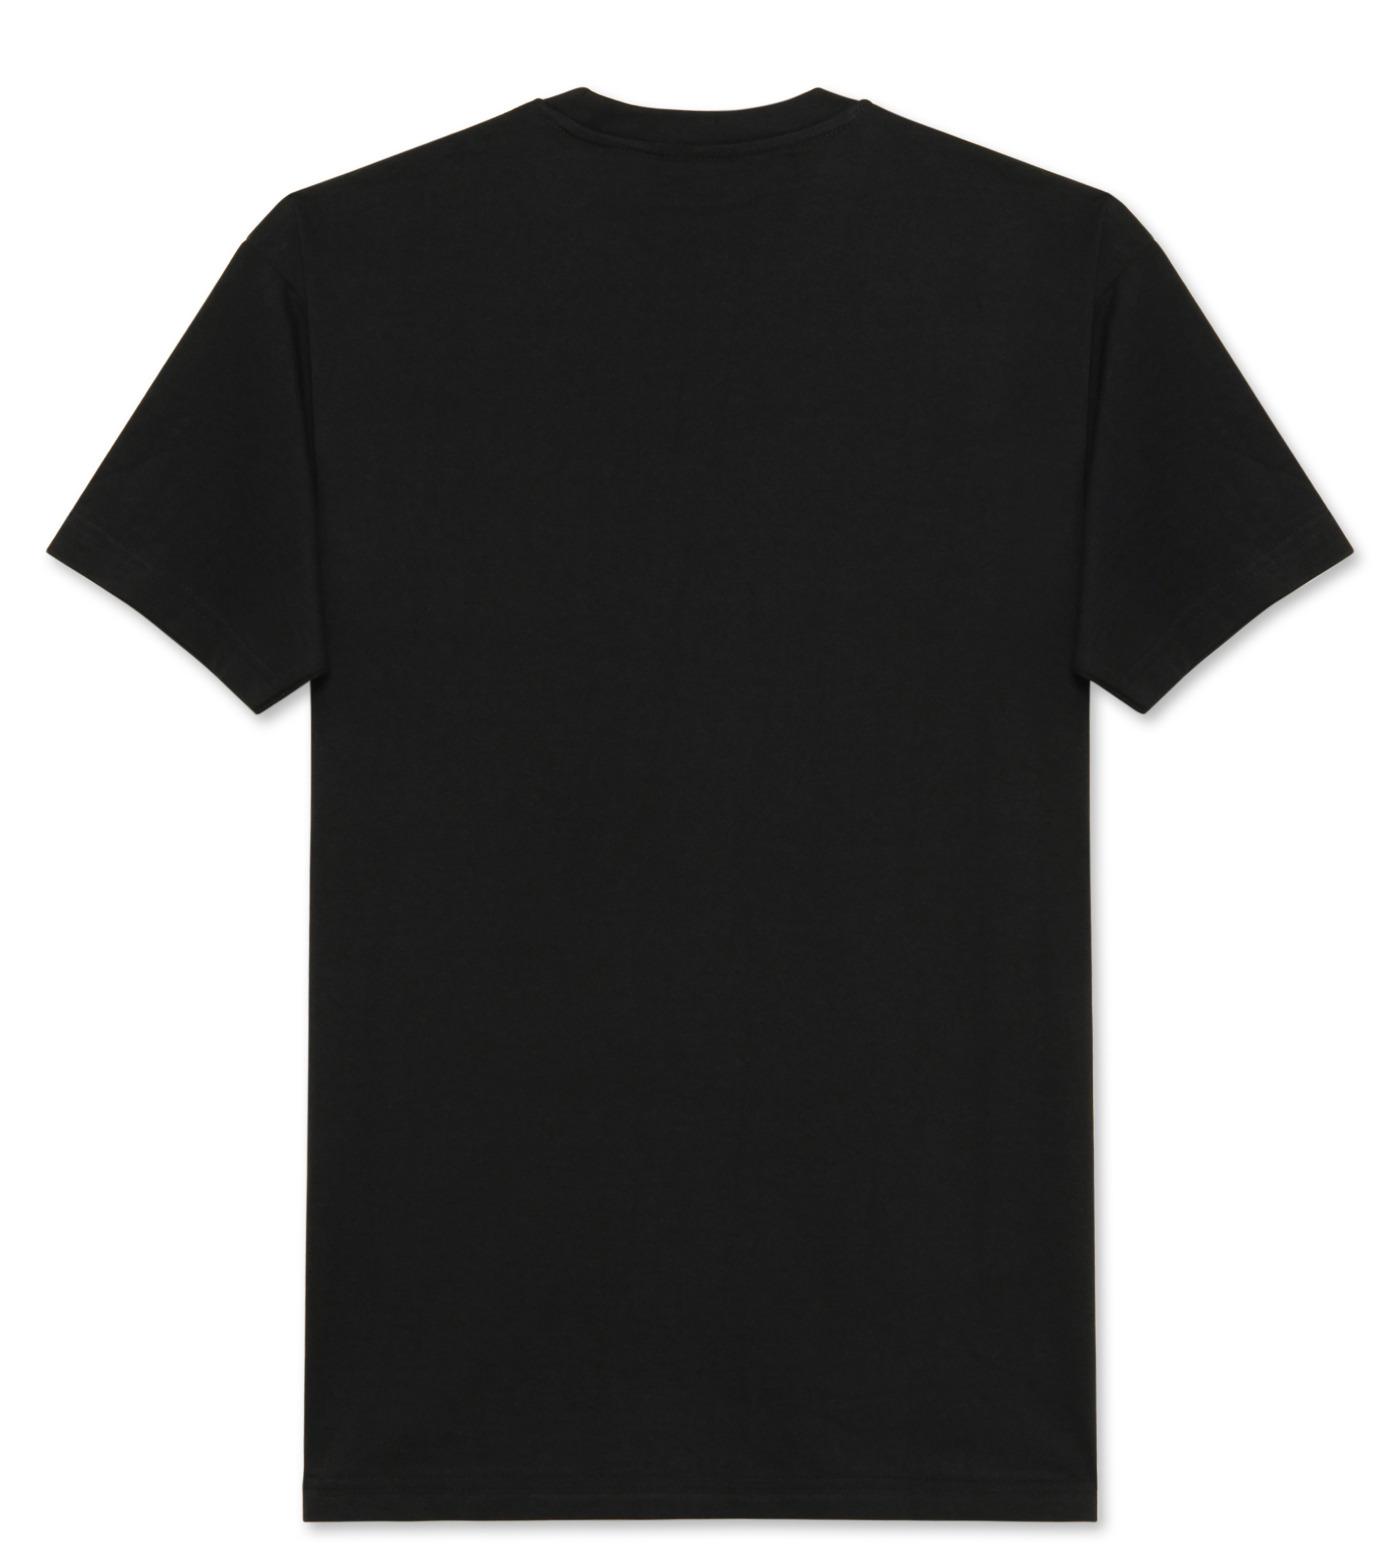 Germeii(ジェルメイ)のCourtoisie Tee-BLACK(トップス/tops)-TS017SS14-13 拡大詳細画像2